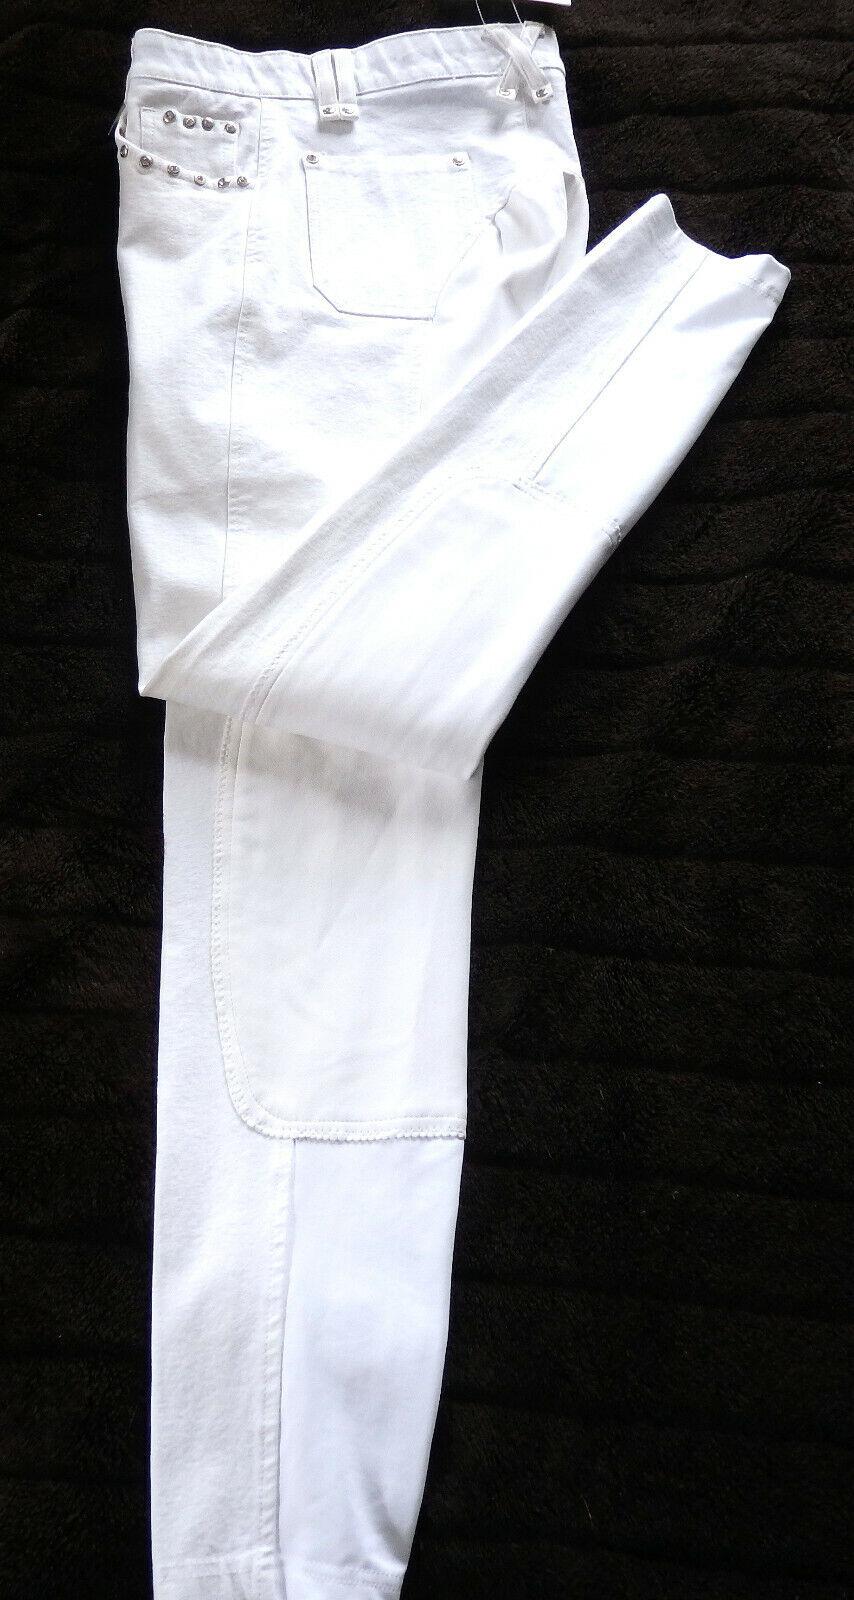 KYRON Donna Pantaloni Montala lexy6  G, guarnizione in pieno TG 88, bianco, Glitzersteine 231